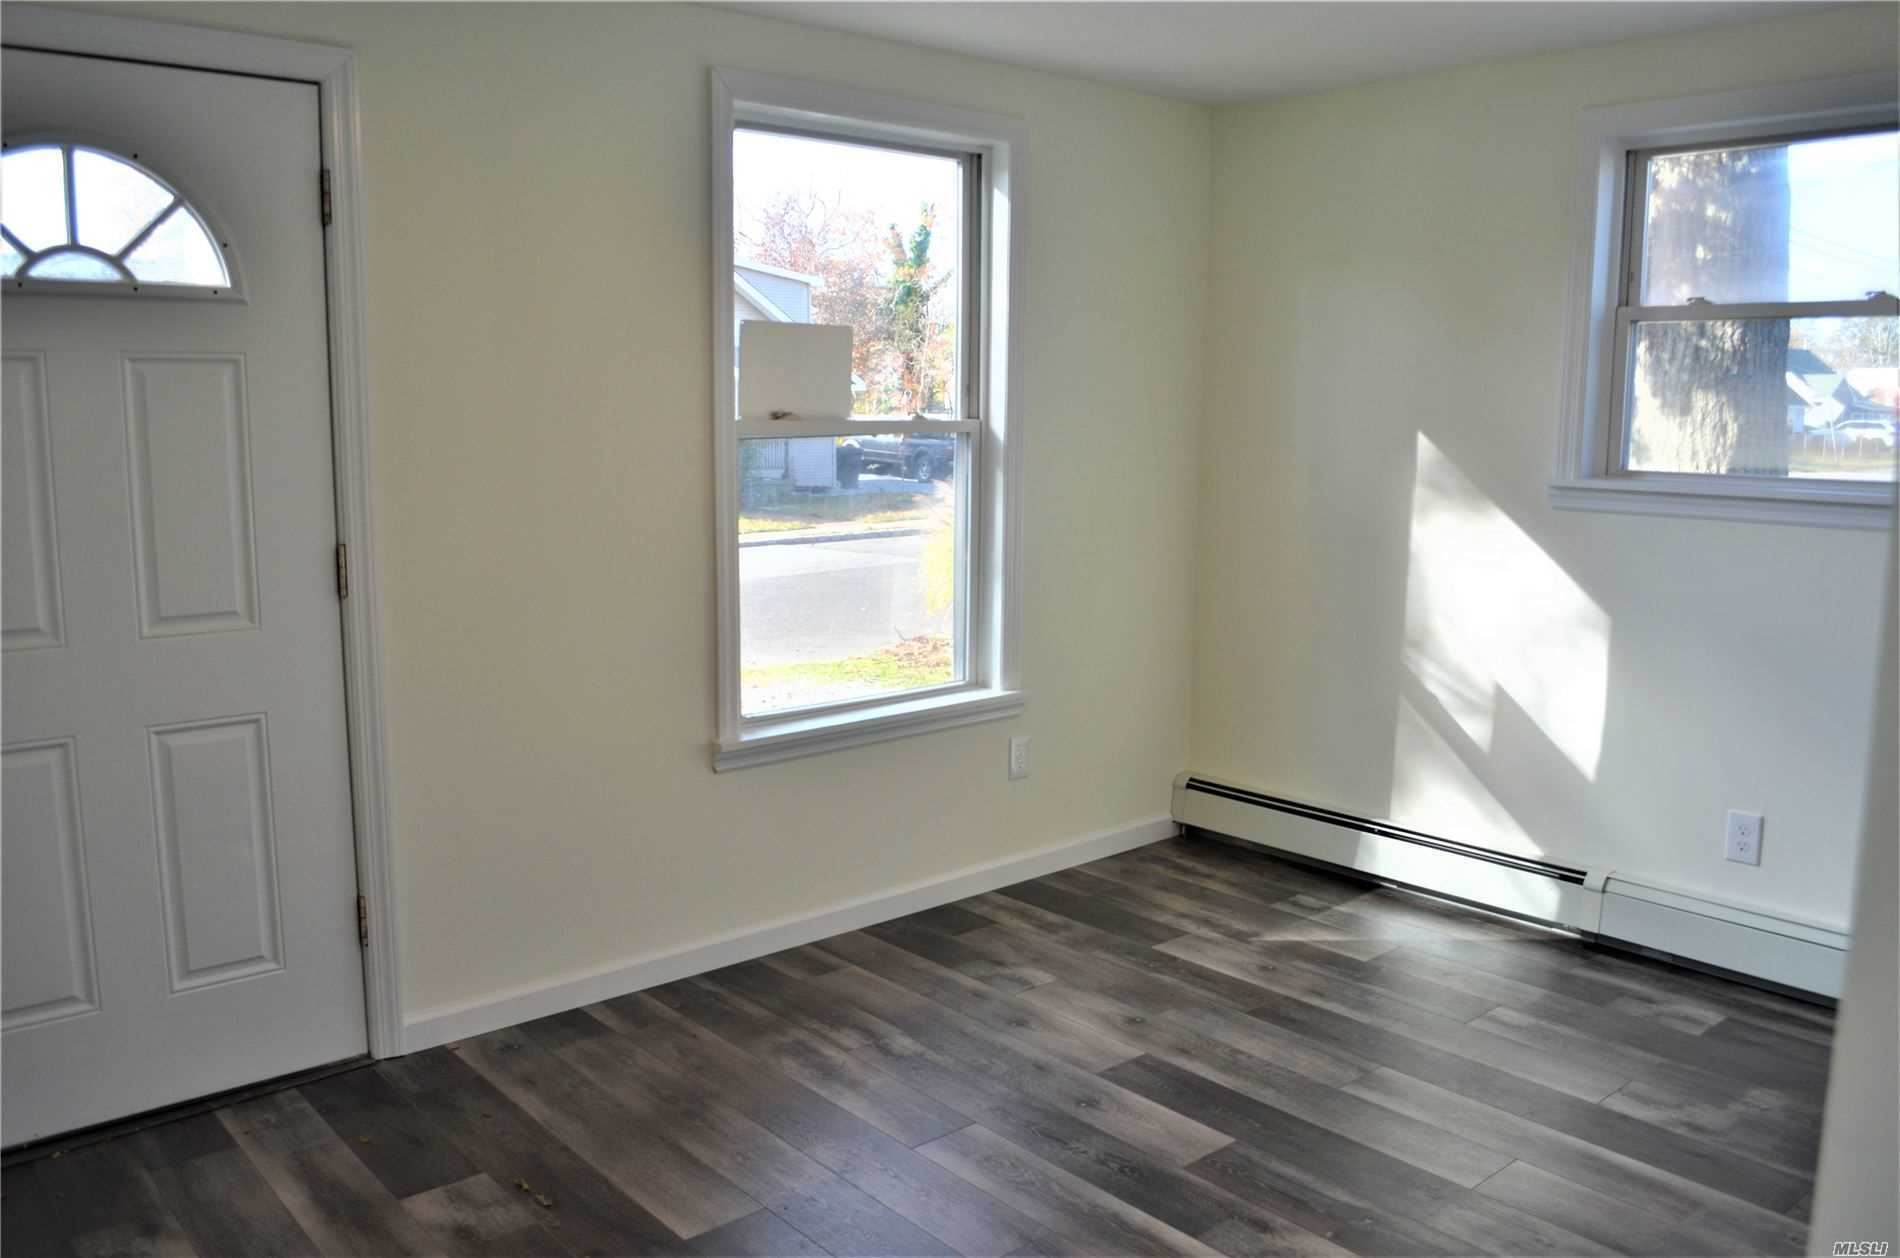 61 Belford, Bay Shore, NY 11706 - MLS#: 3165904